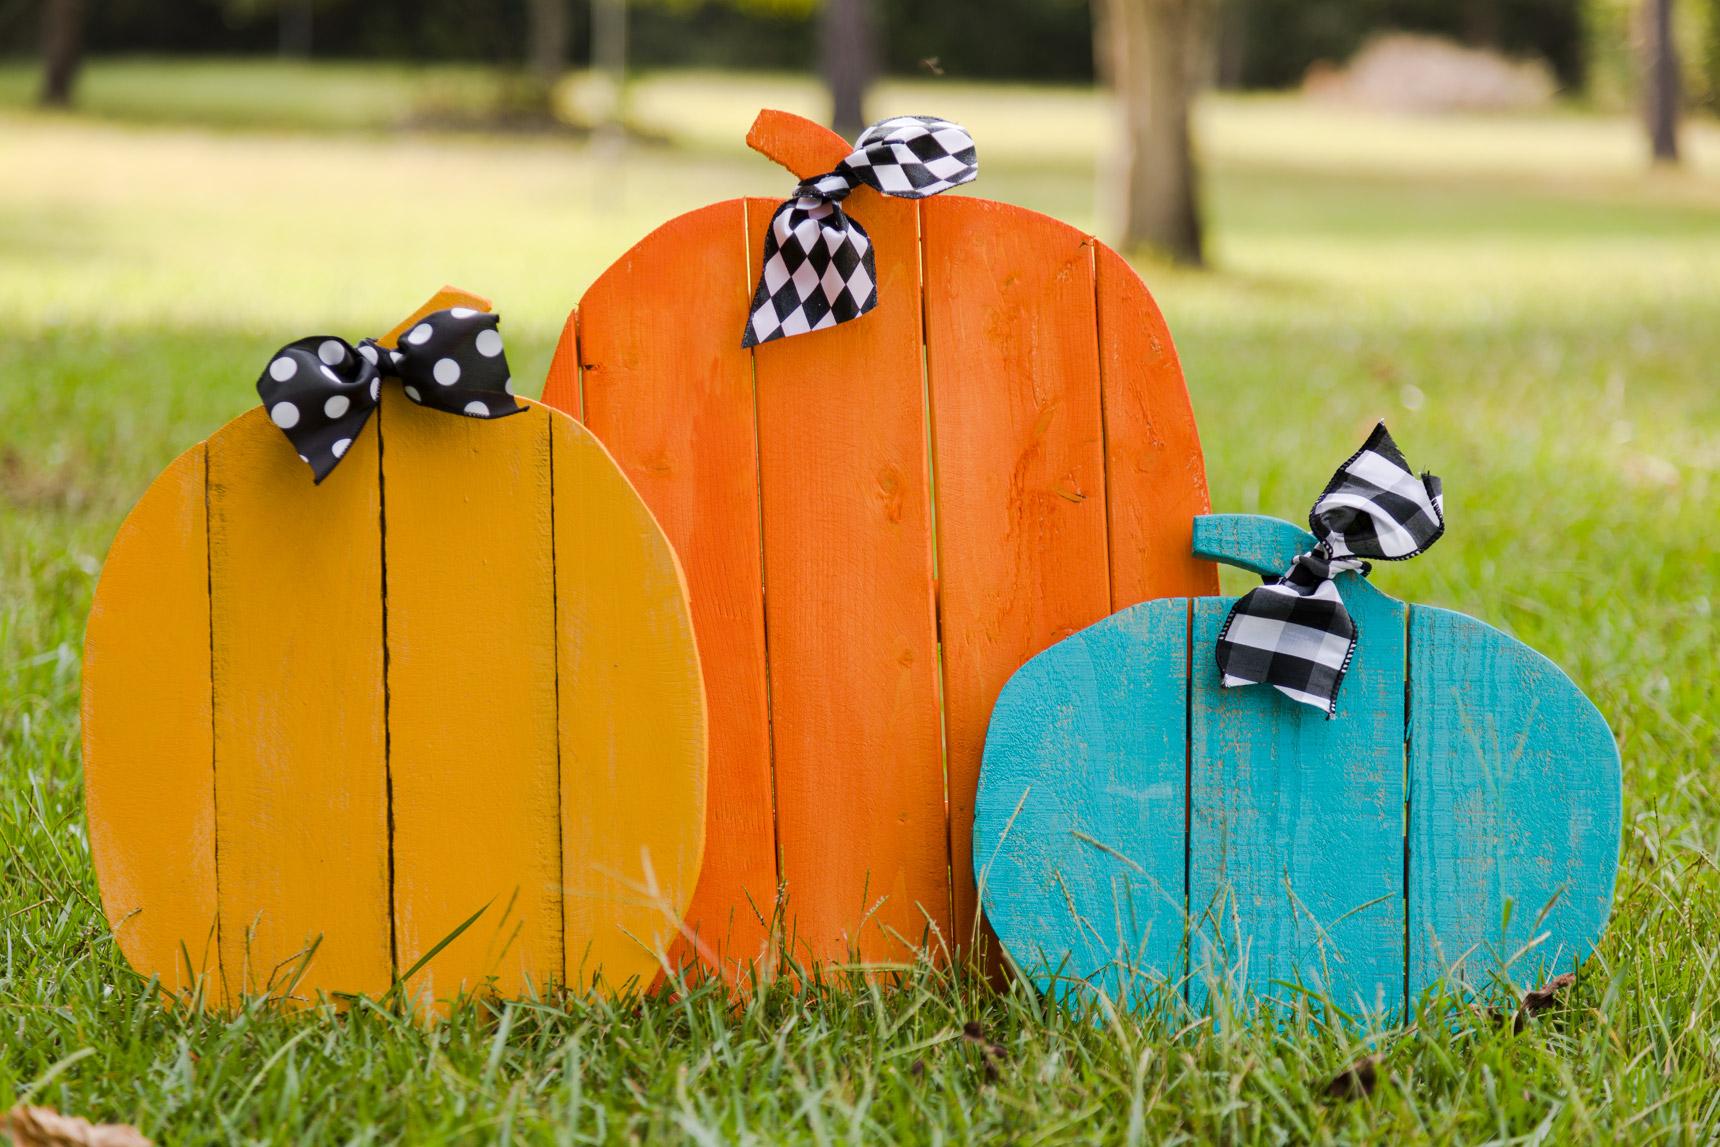 Orange, yellow and teal pustic pallet pumpkins